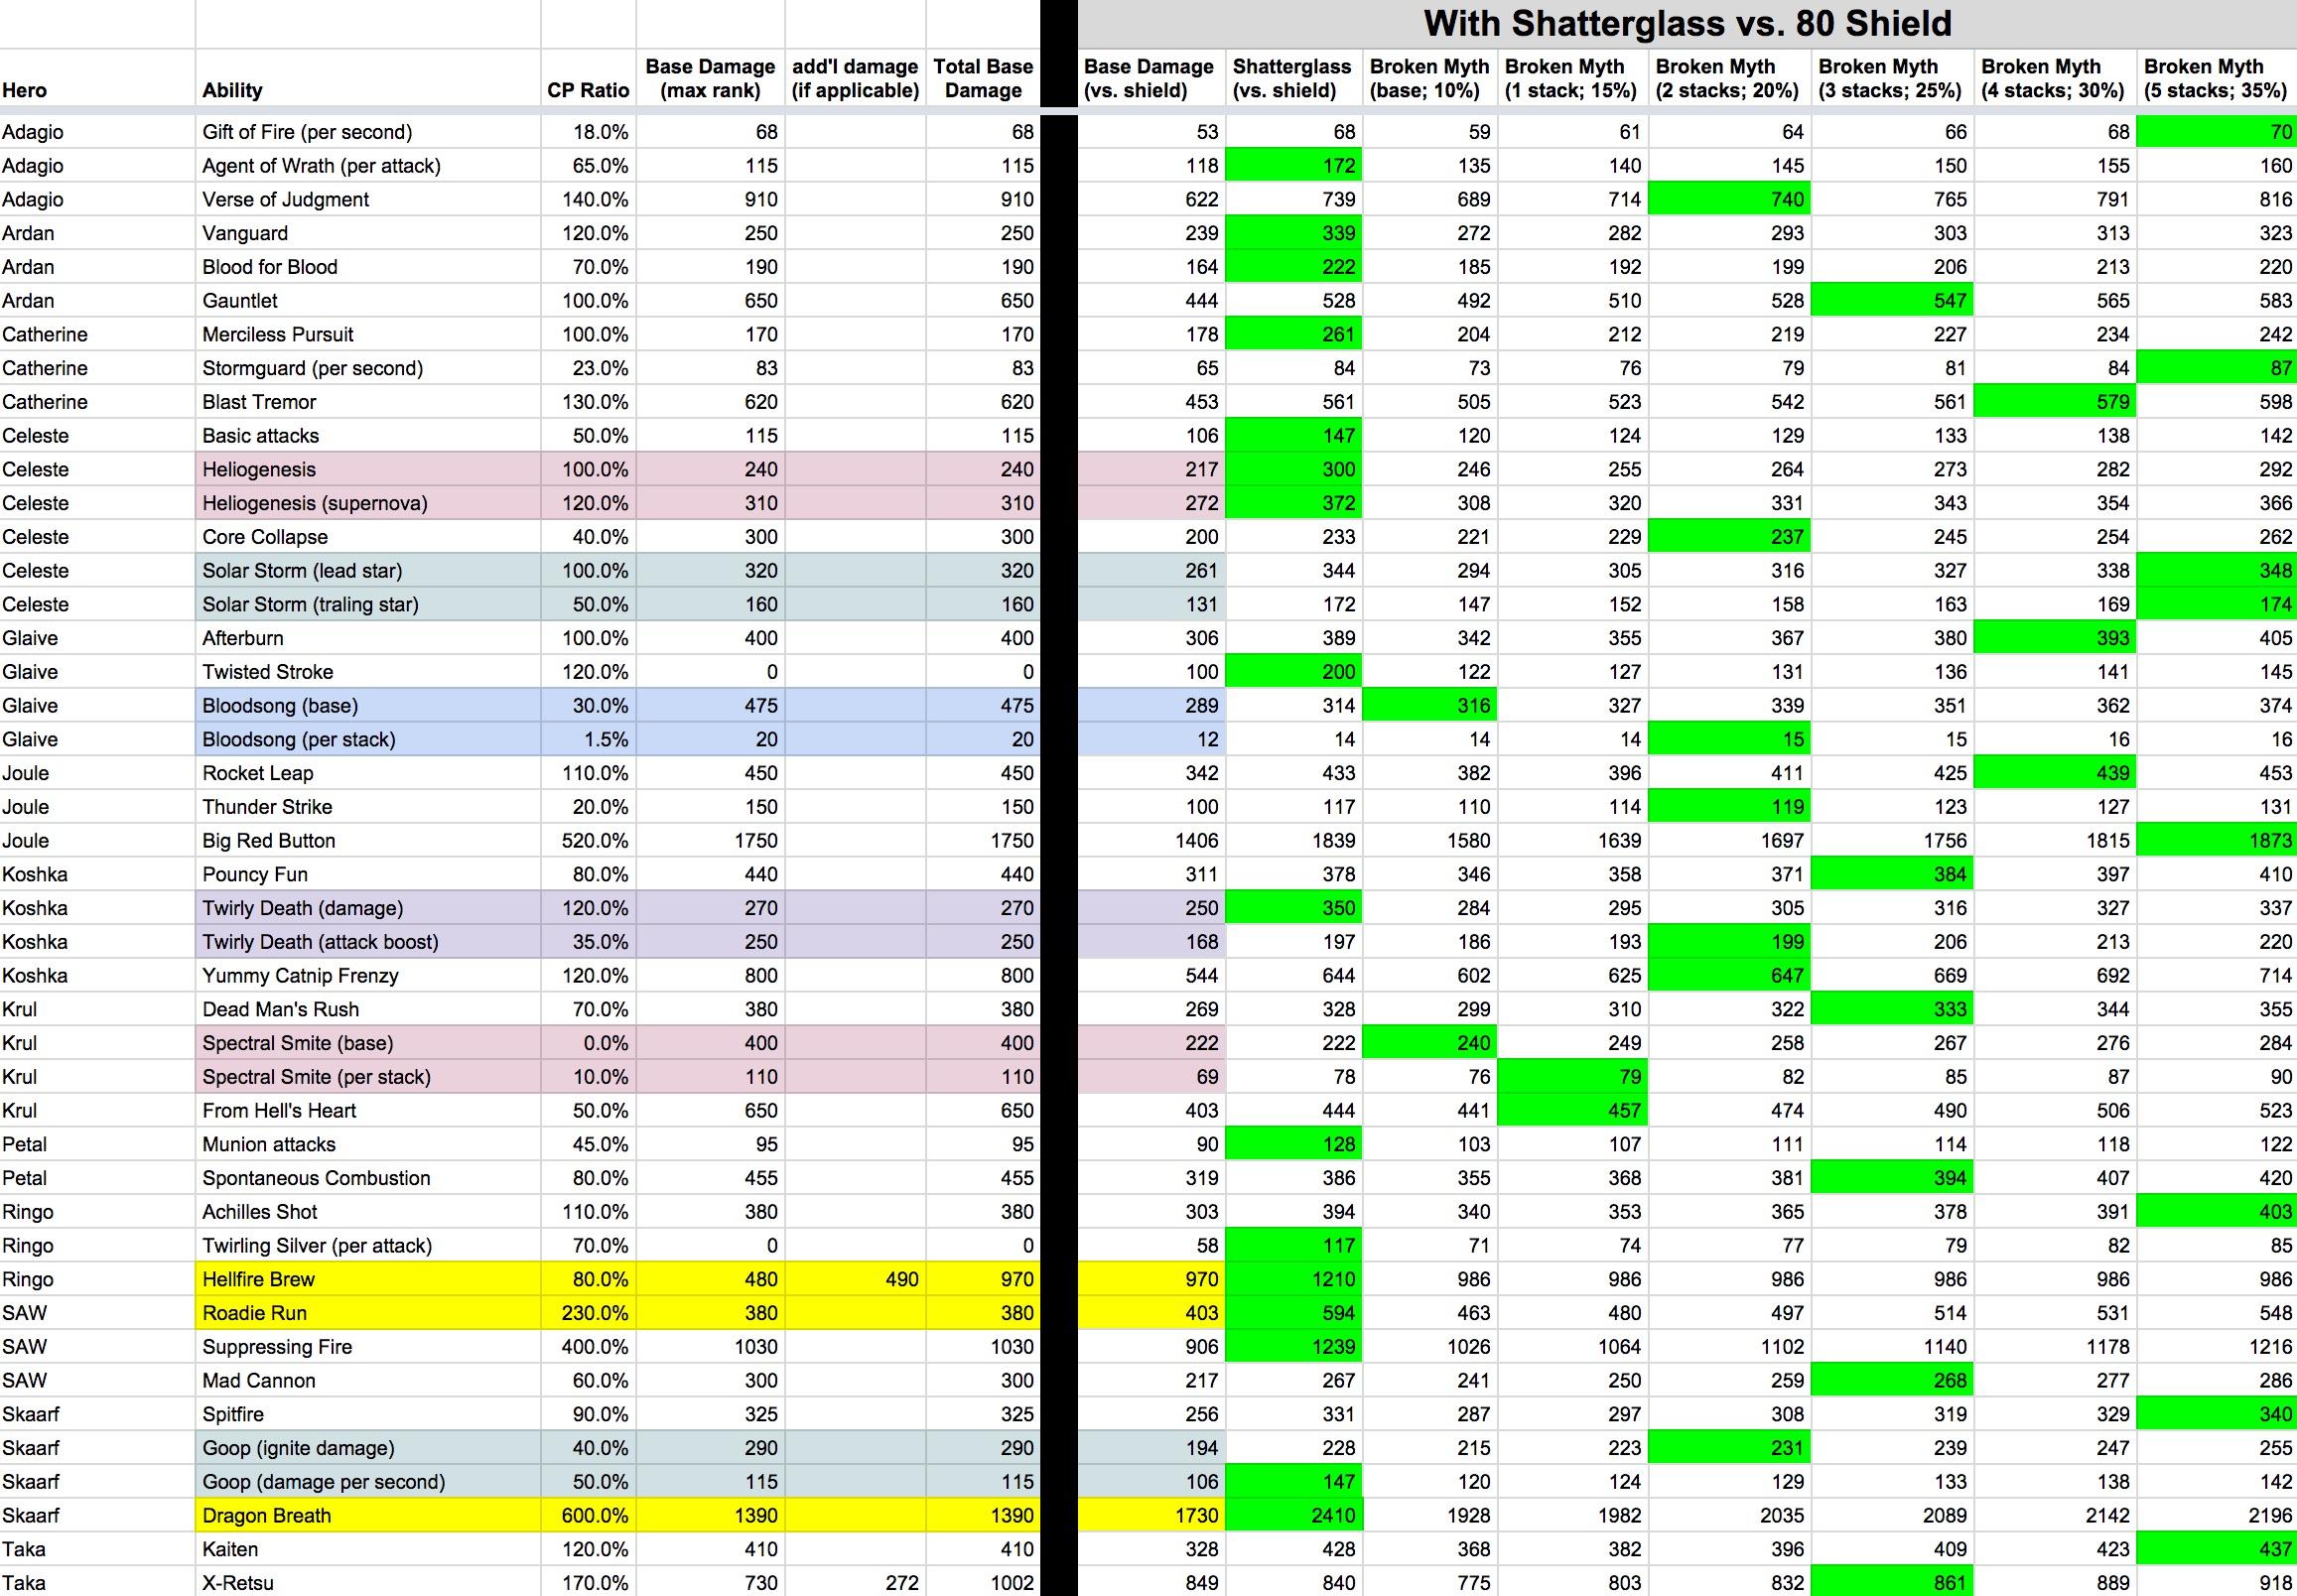 Comparing 2nd Shatterglass and Broken Myth vs. 80 shield defense